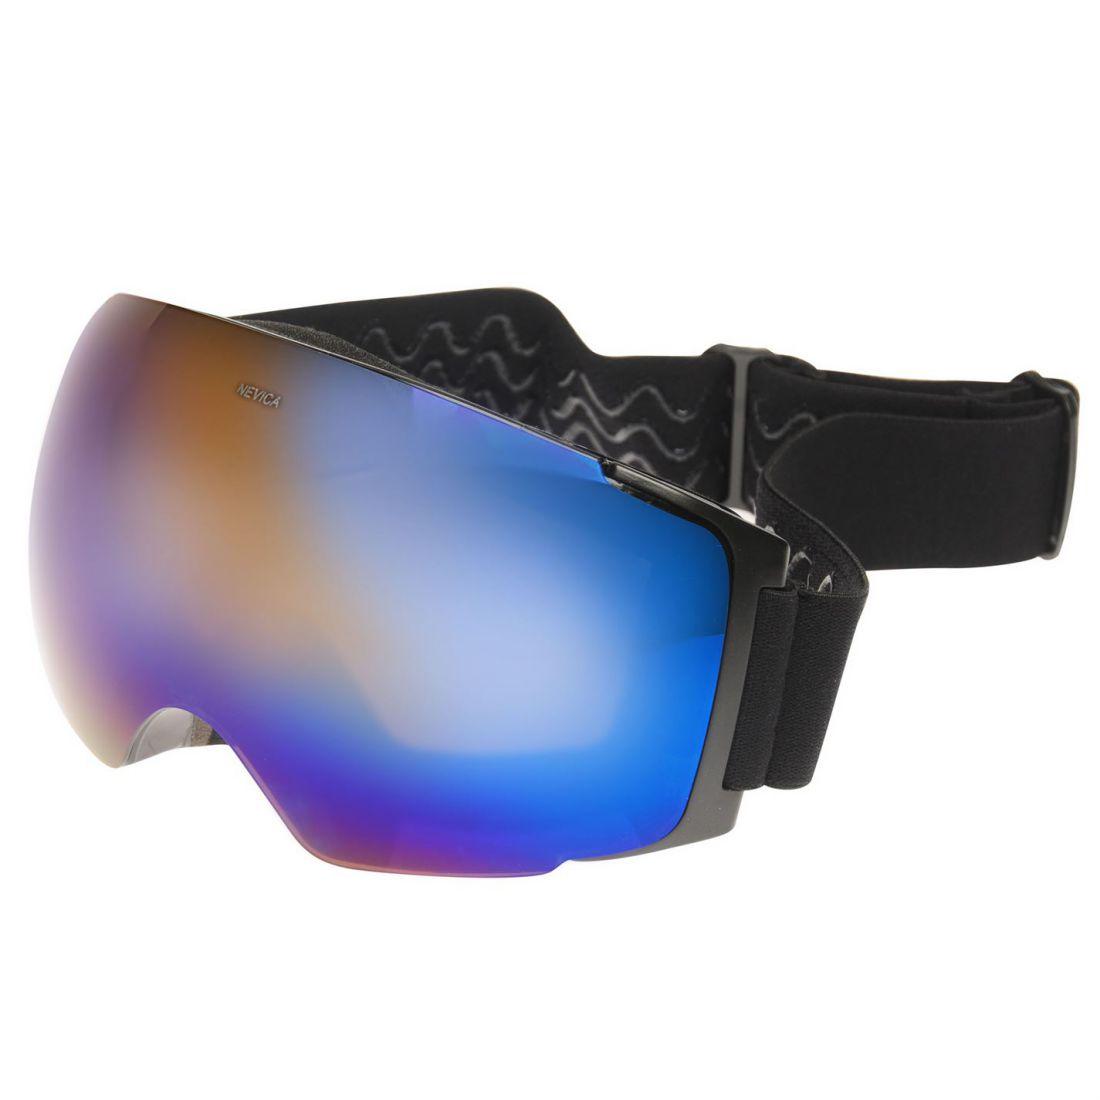 7629bb7e64fb Nevica Mens Aspen Magnetic Ski Goggles Zip Headstrap 5057918458657 ...